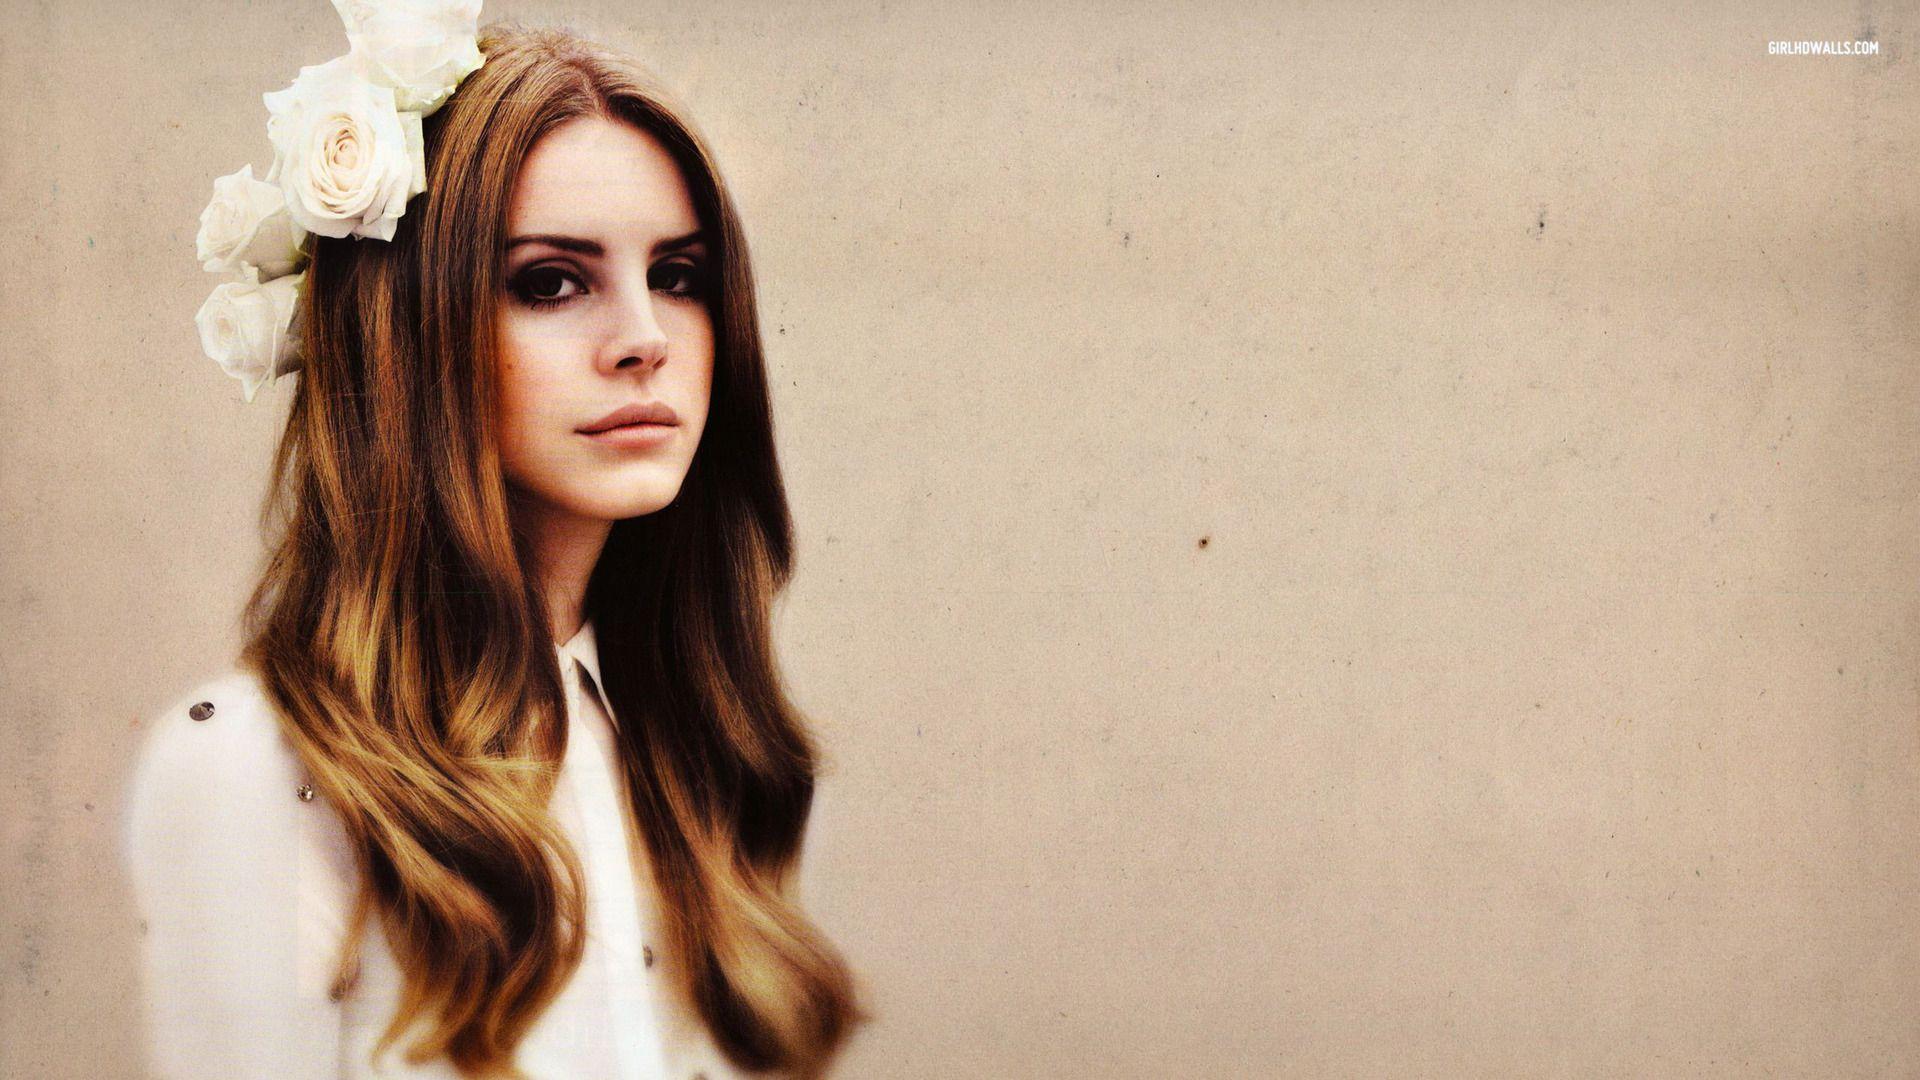 Lana Del Rey Wallpapers 1920x1080 Full Hd Pictures Lana Del Rey Beauty Hair Beauty